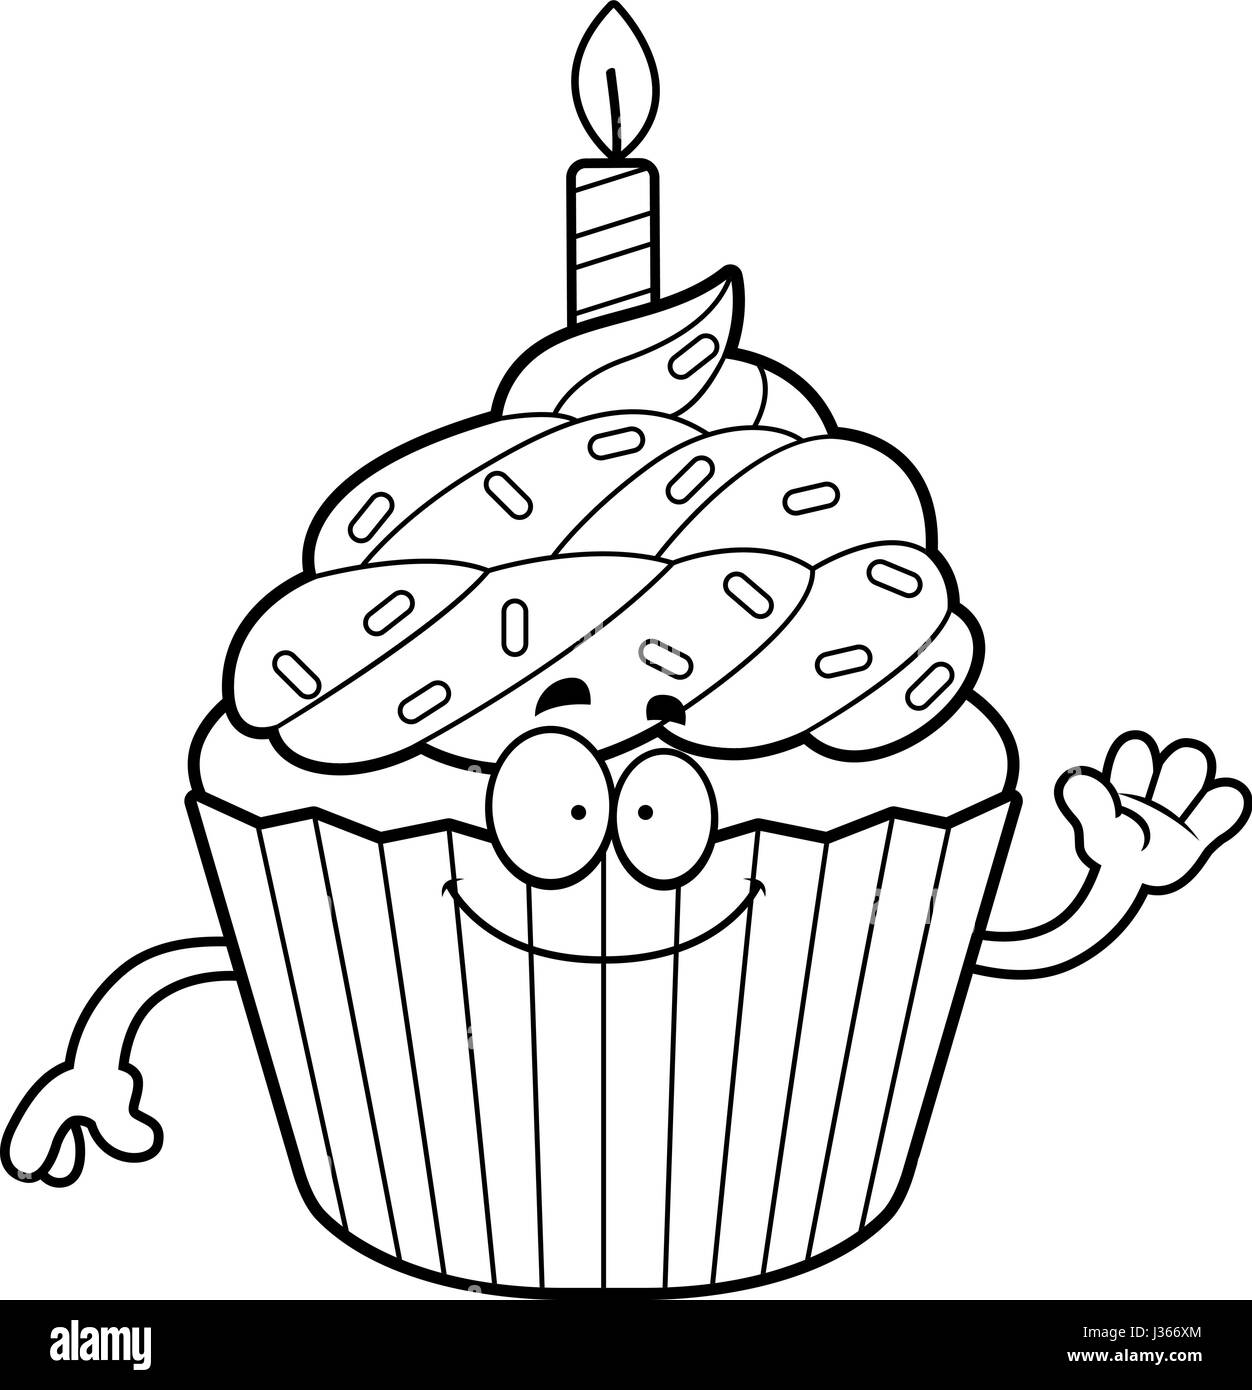 cartoon cupcake sprinkles smiling happy black and white stock photos